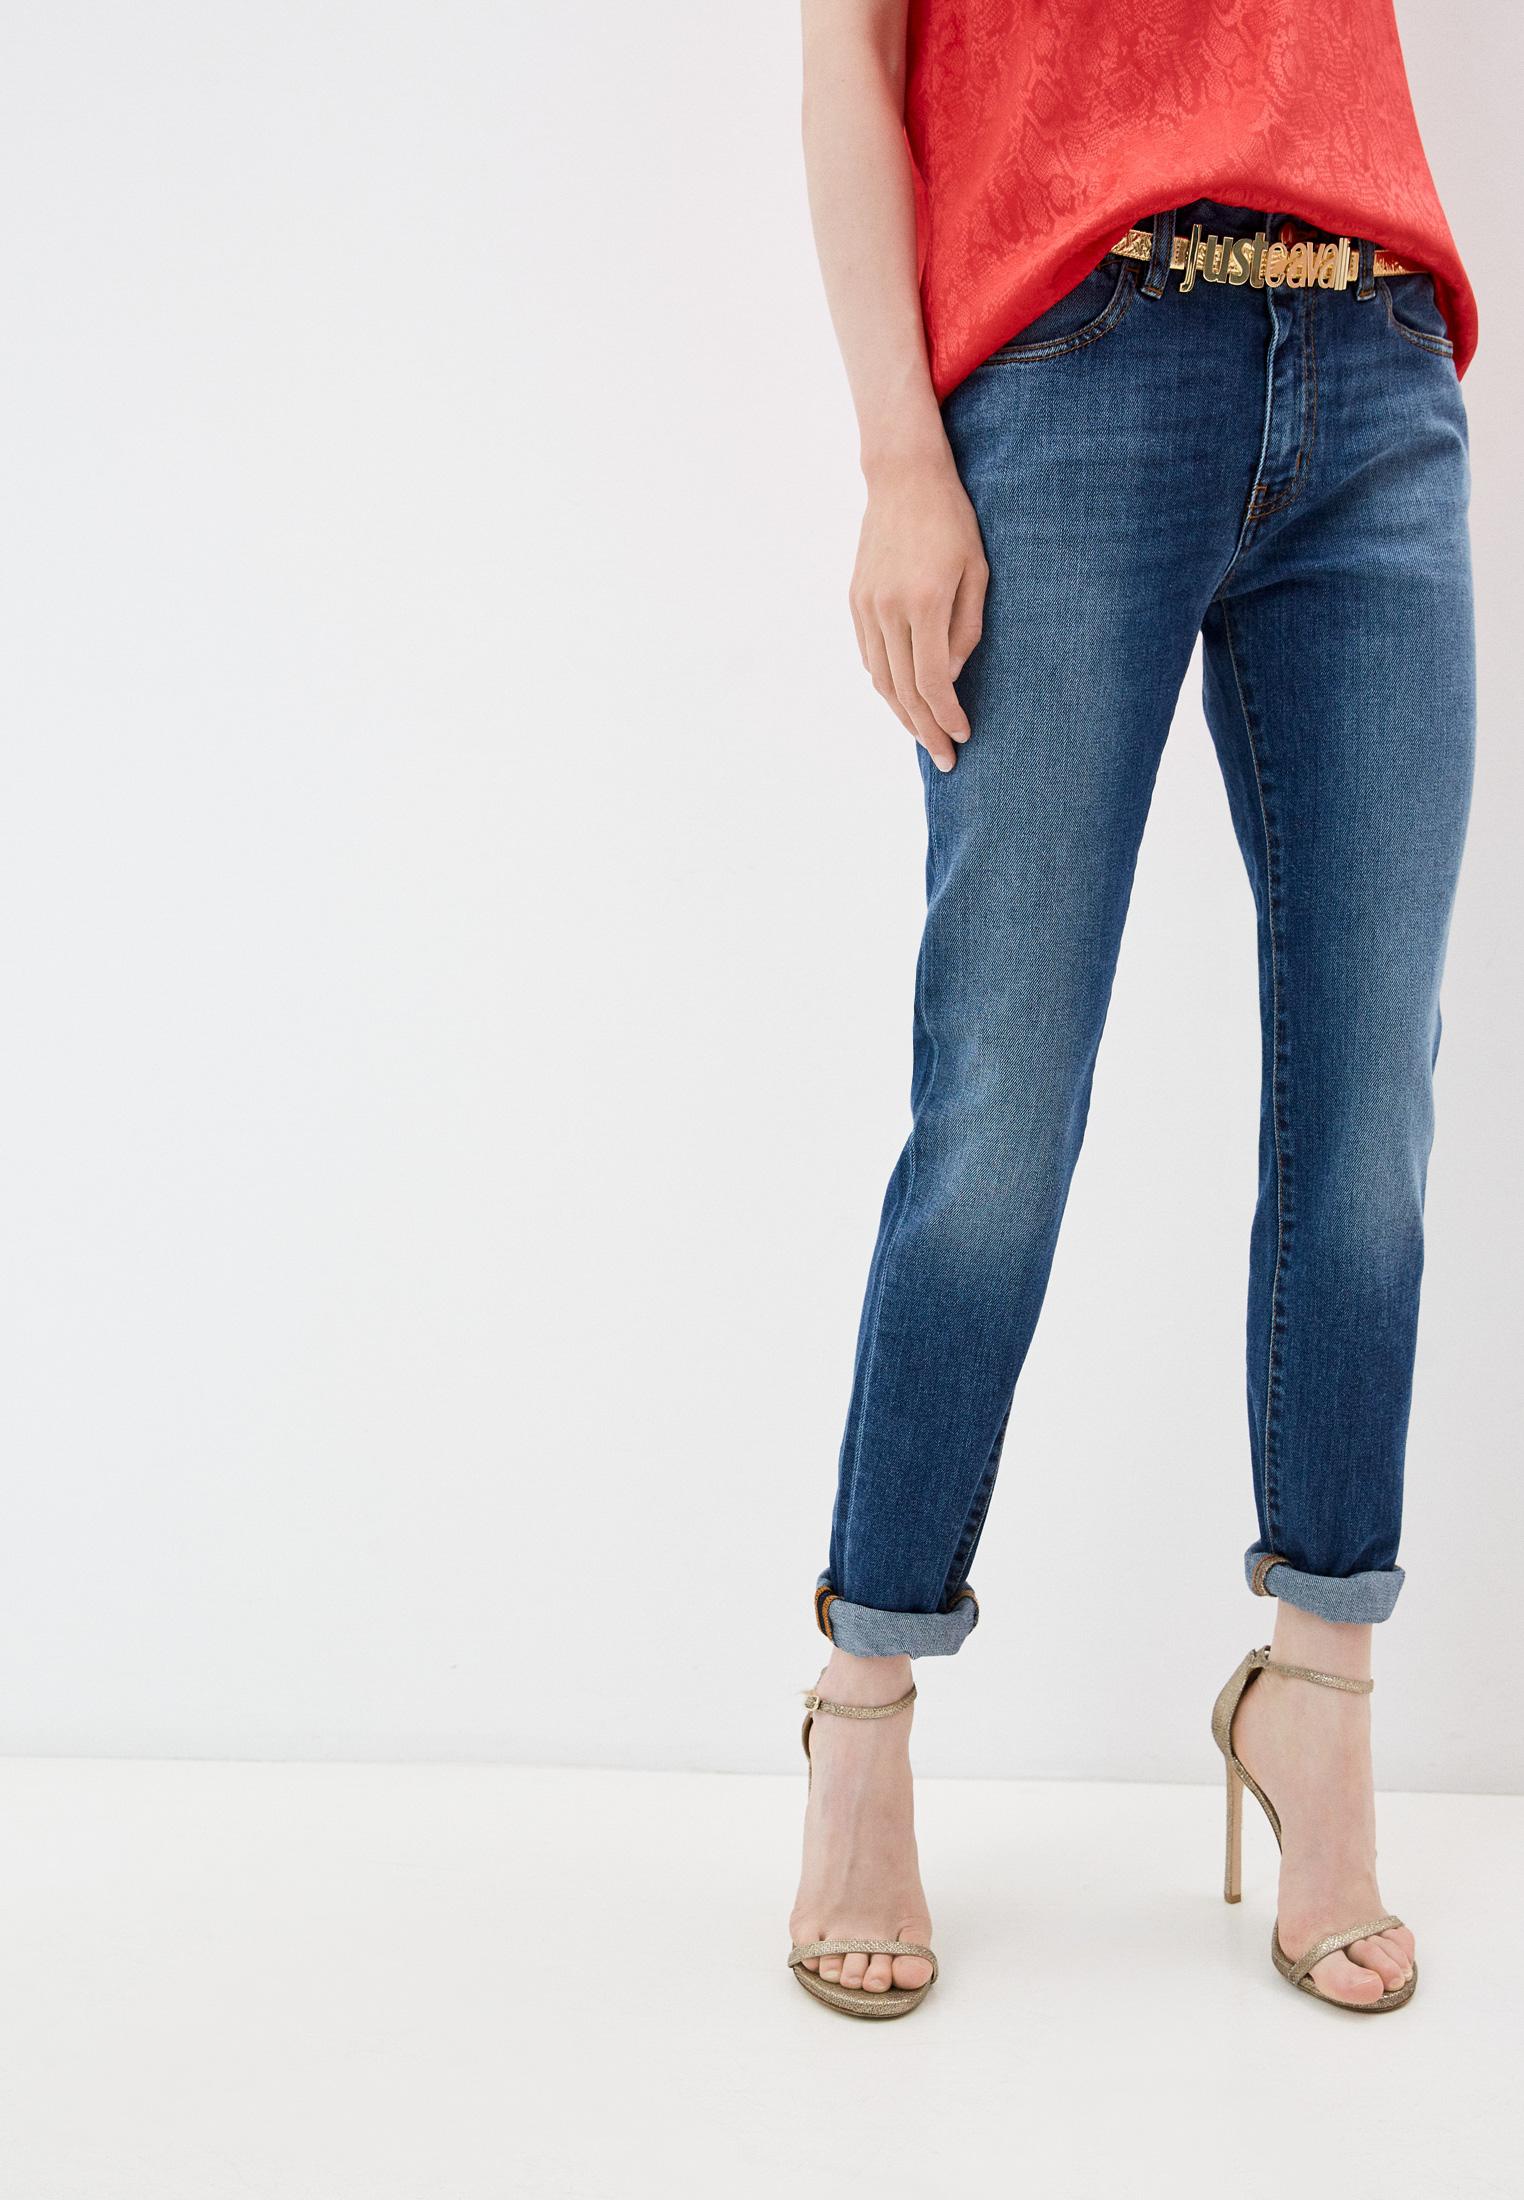 Зауженные джинсы Just Cavalli (Джаст Кавалли) S04LA0141 N31711